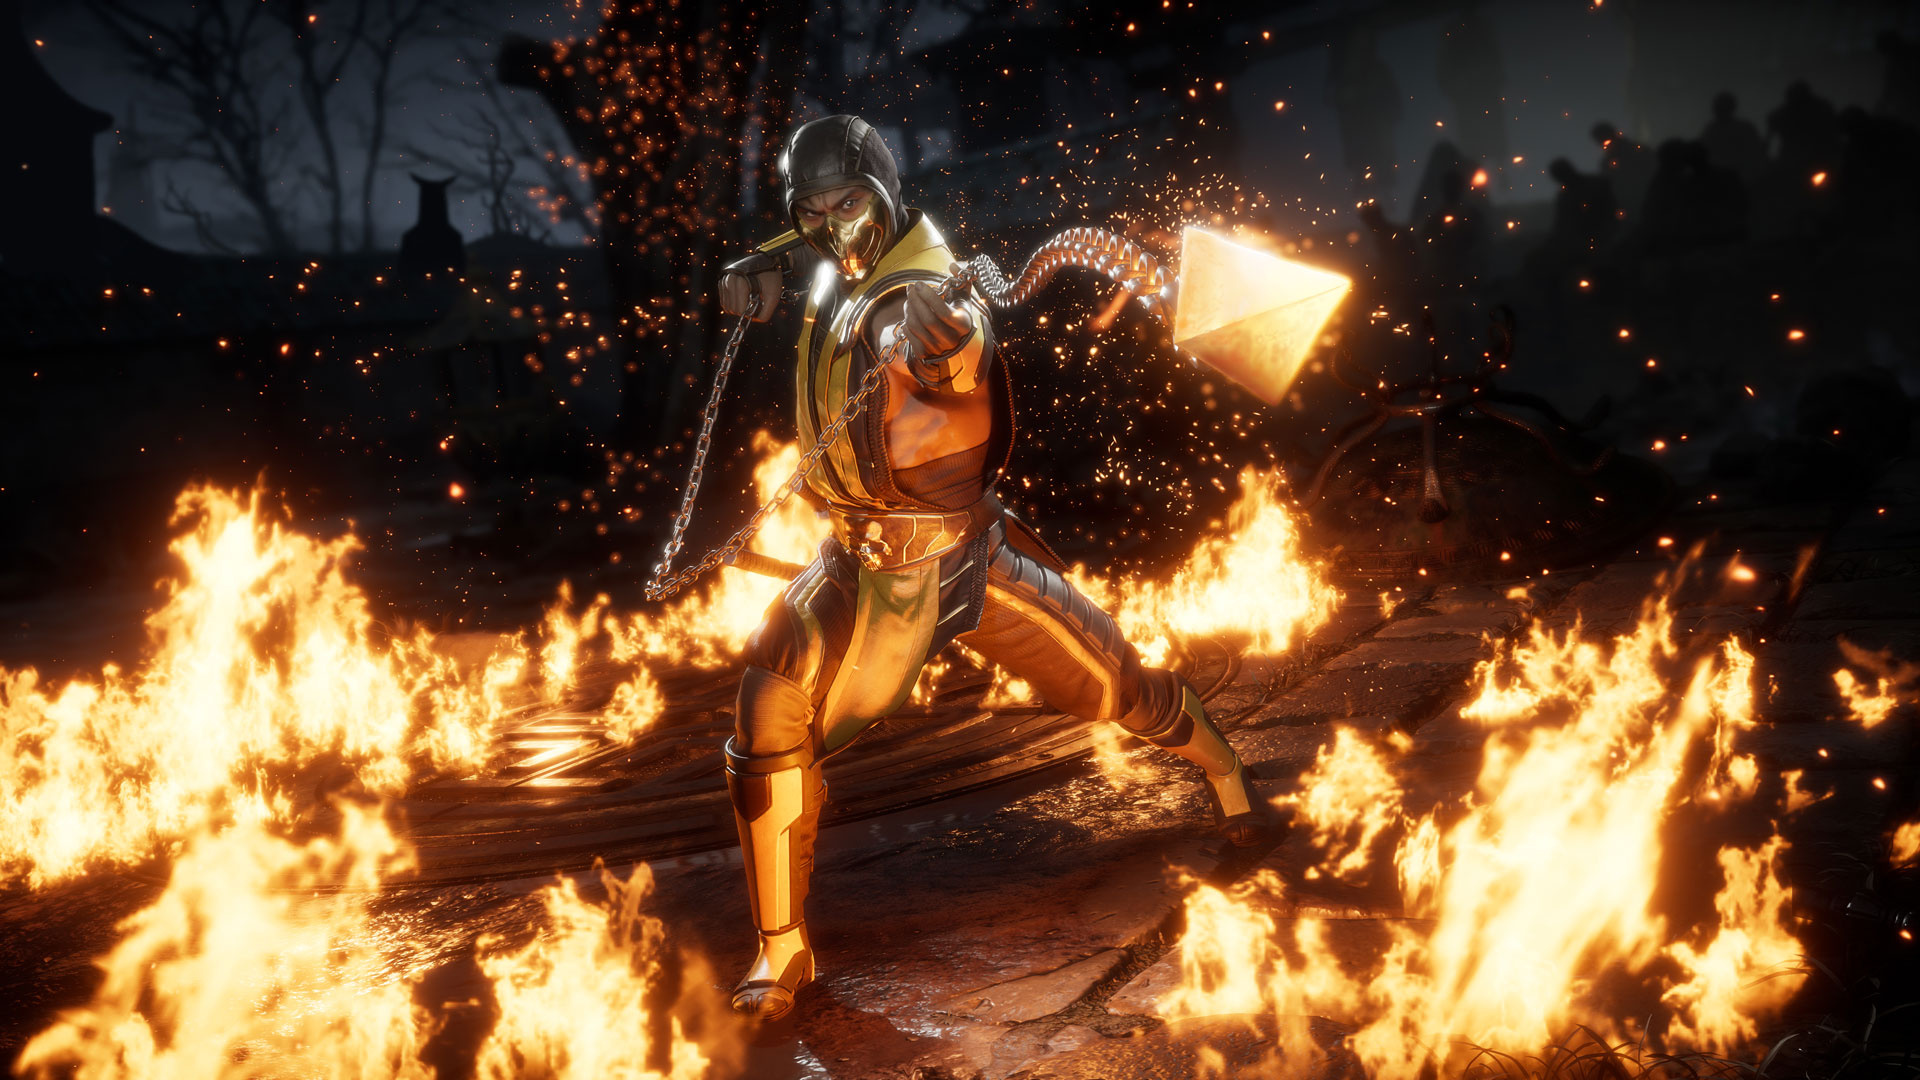 Random Ed Boon Finds Recent Mortal Kombat 11 Roster Leak